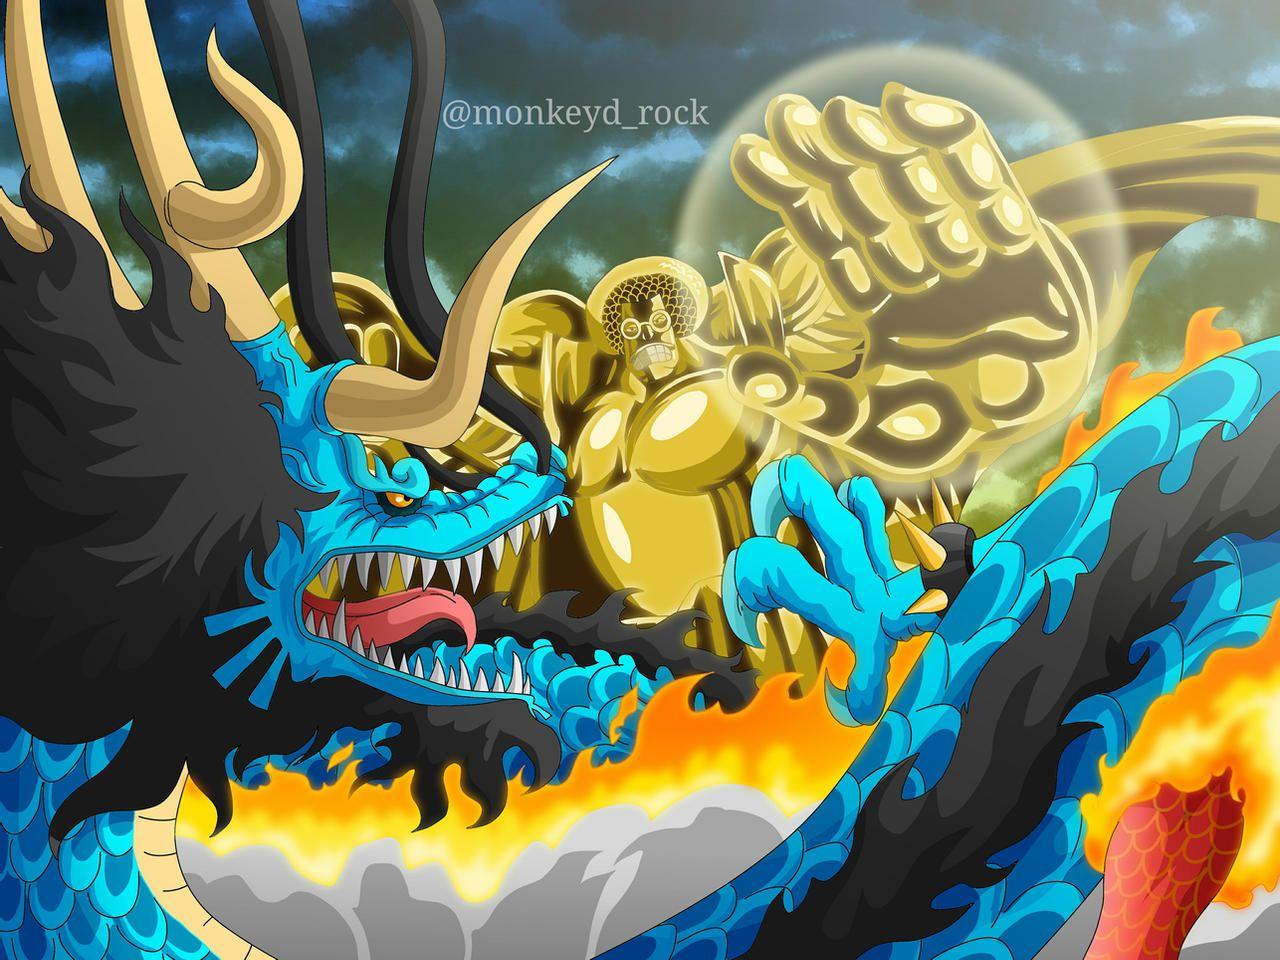 Kaido vs Sengoku - One Piece | Animes wallpapers, Anime, Desenho de anime